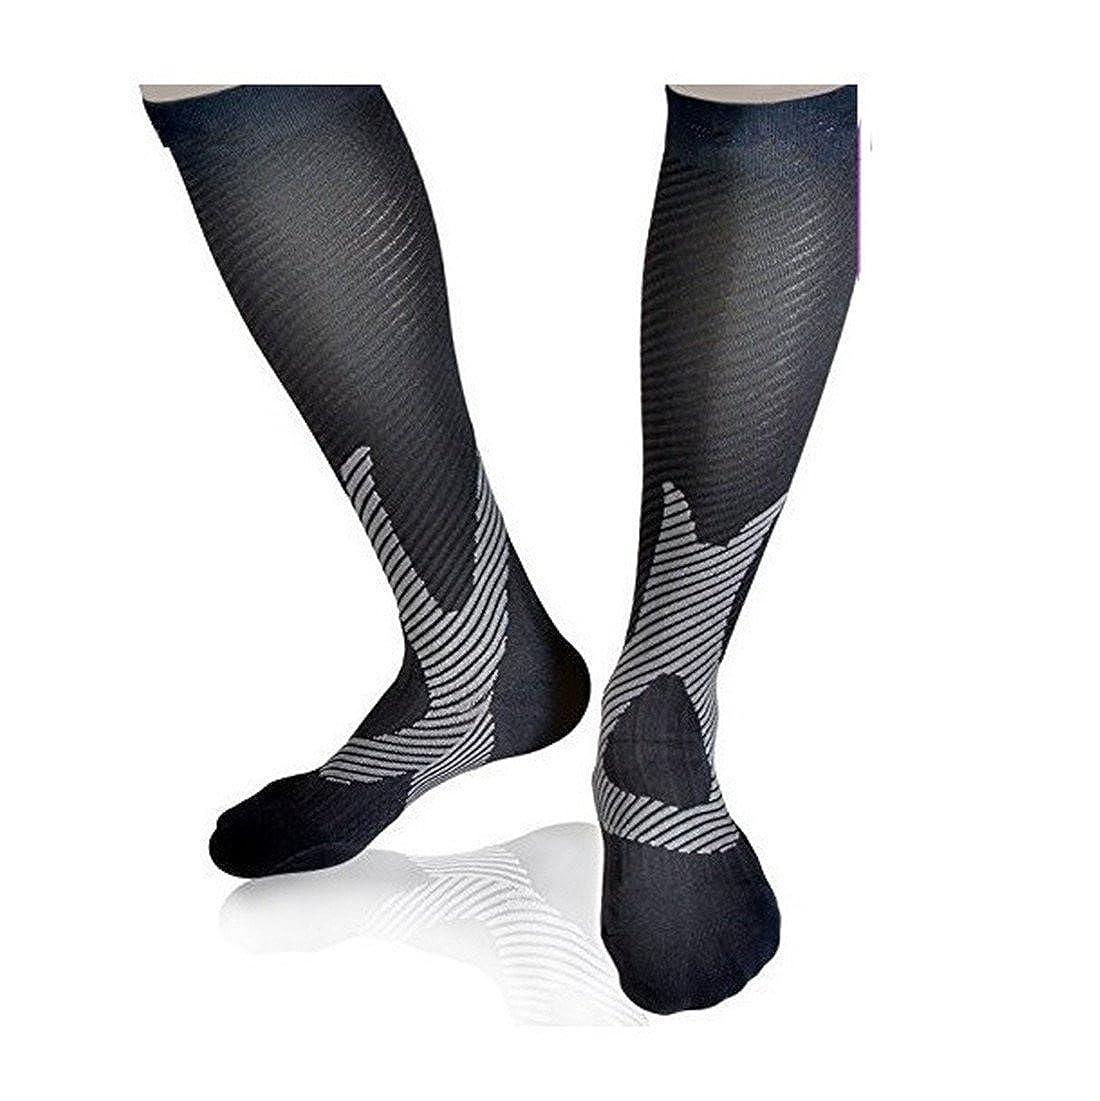 11338cc2c77 Compression Socks for Women Men Running Athletic Sports Crossfit Flight  Travel  Amazon.co.uk  Sports   Outdoors